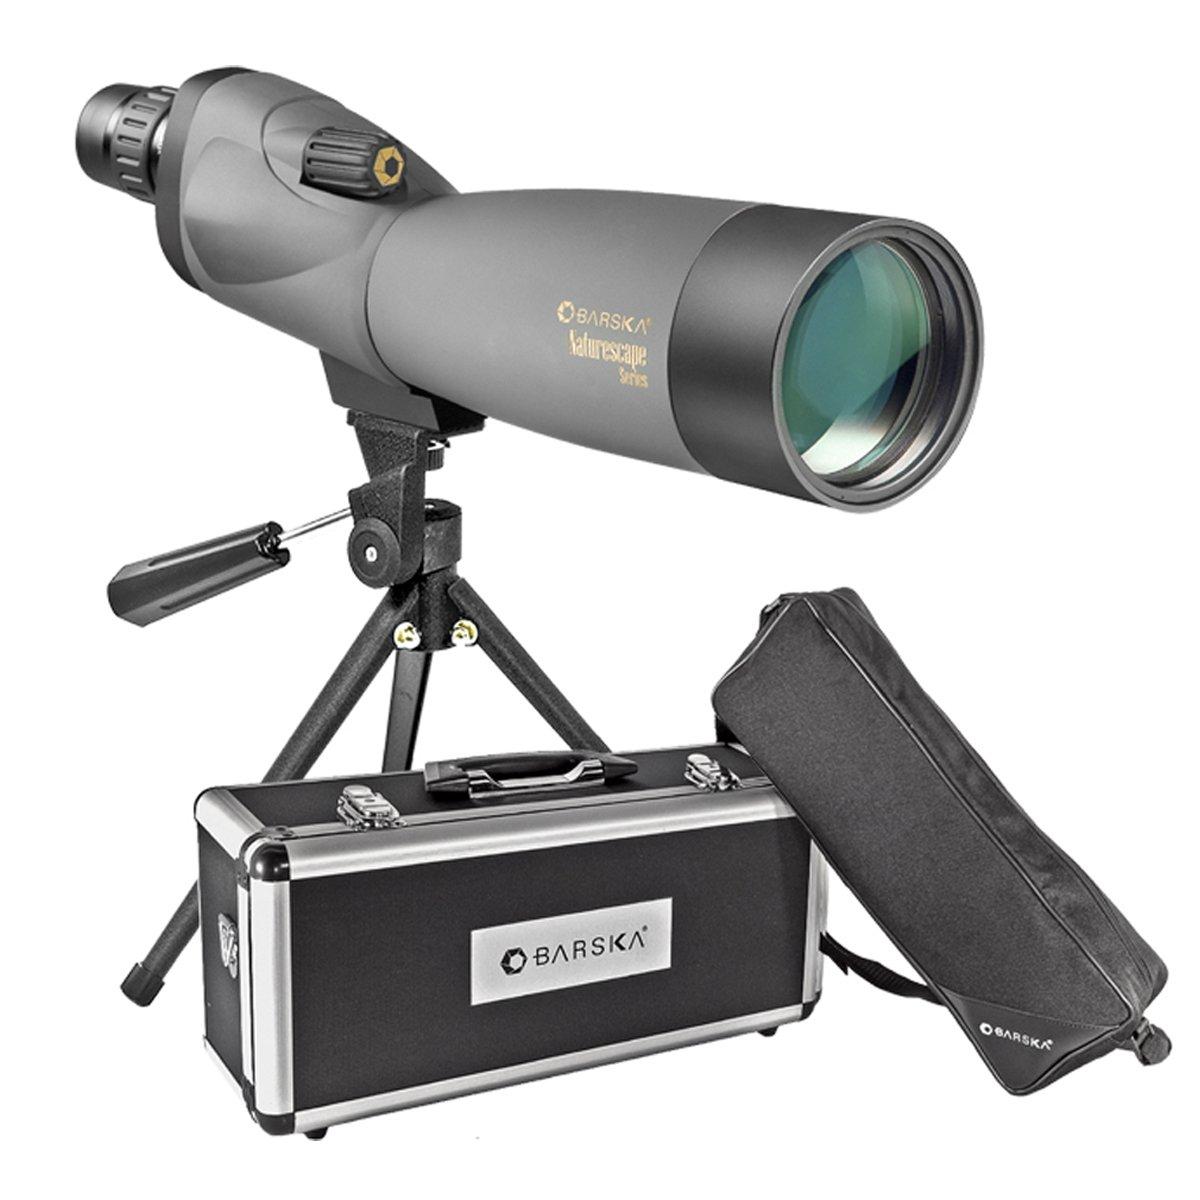 BARSKA Naturescape 20-60x60 Waterproof Spotting Scope w/ Tripod, Soft Carry Case & Premium Hard Case by BARSKA